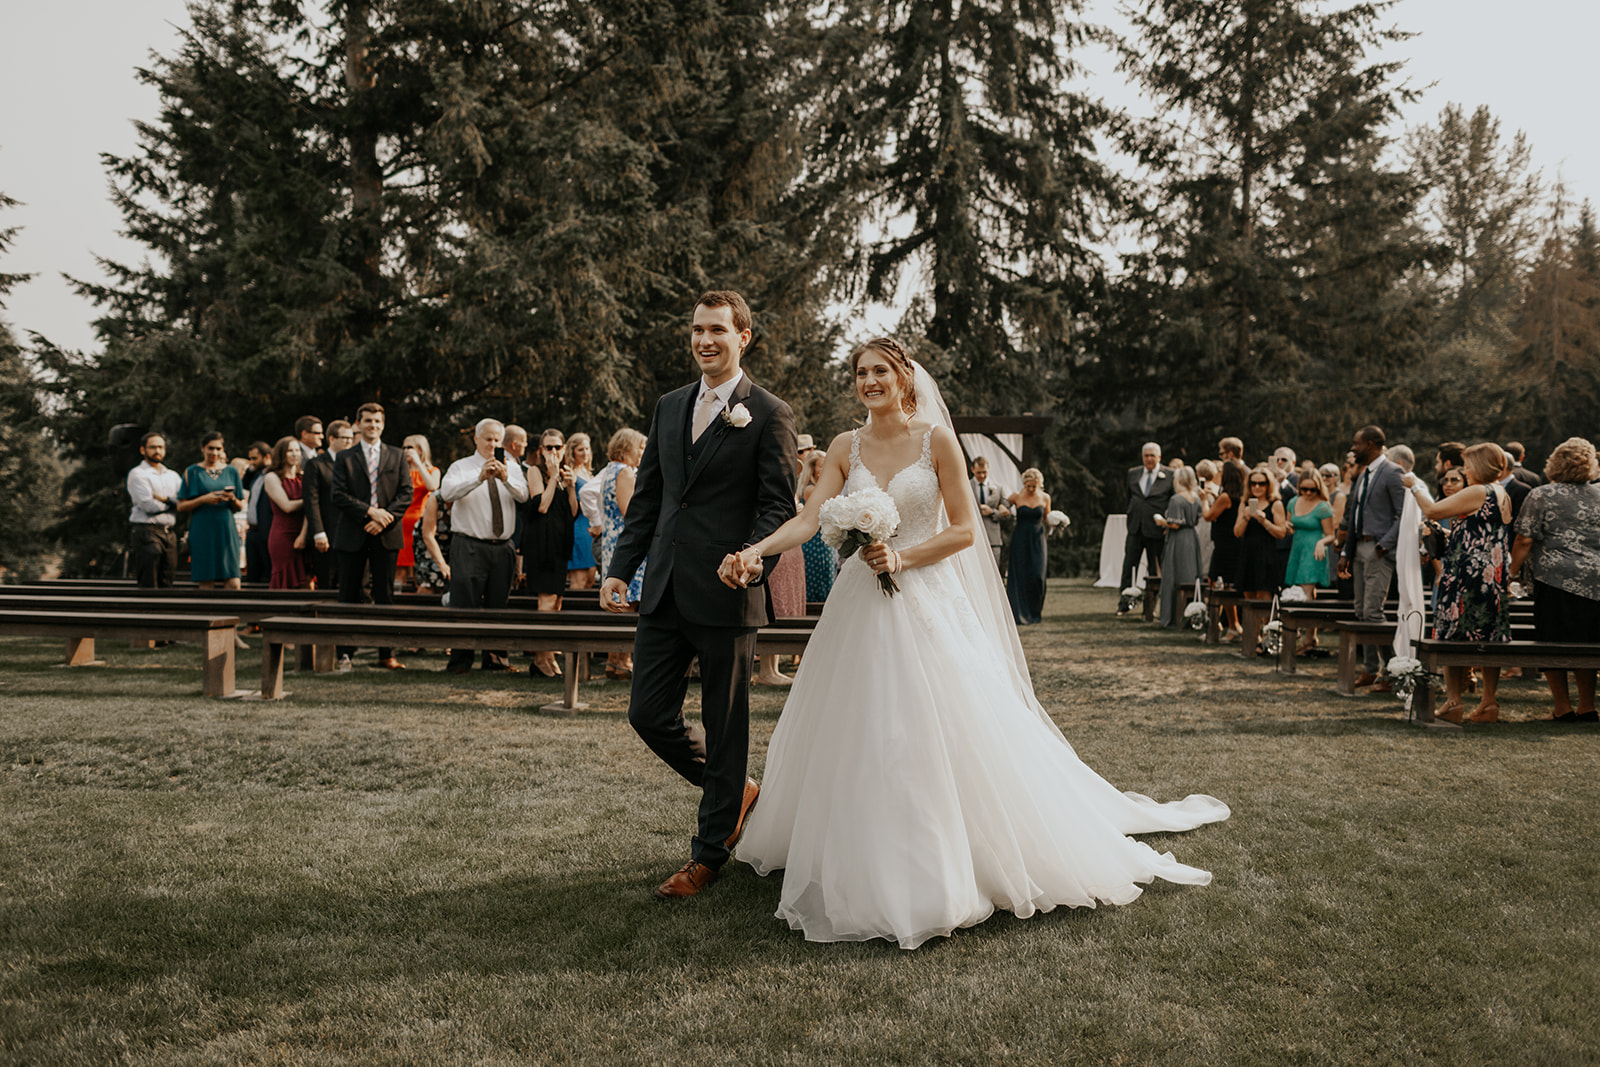 ginapaulson_camiryan_wedding-411.jpg